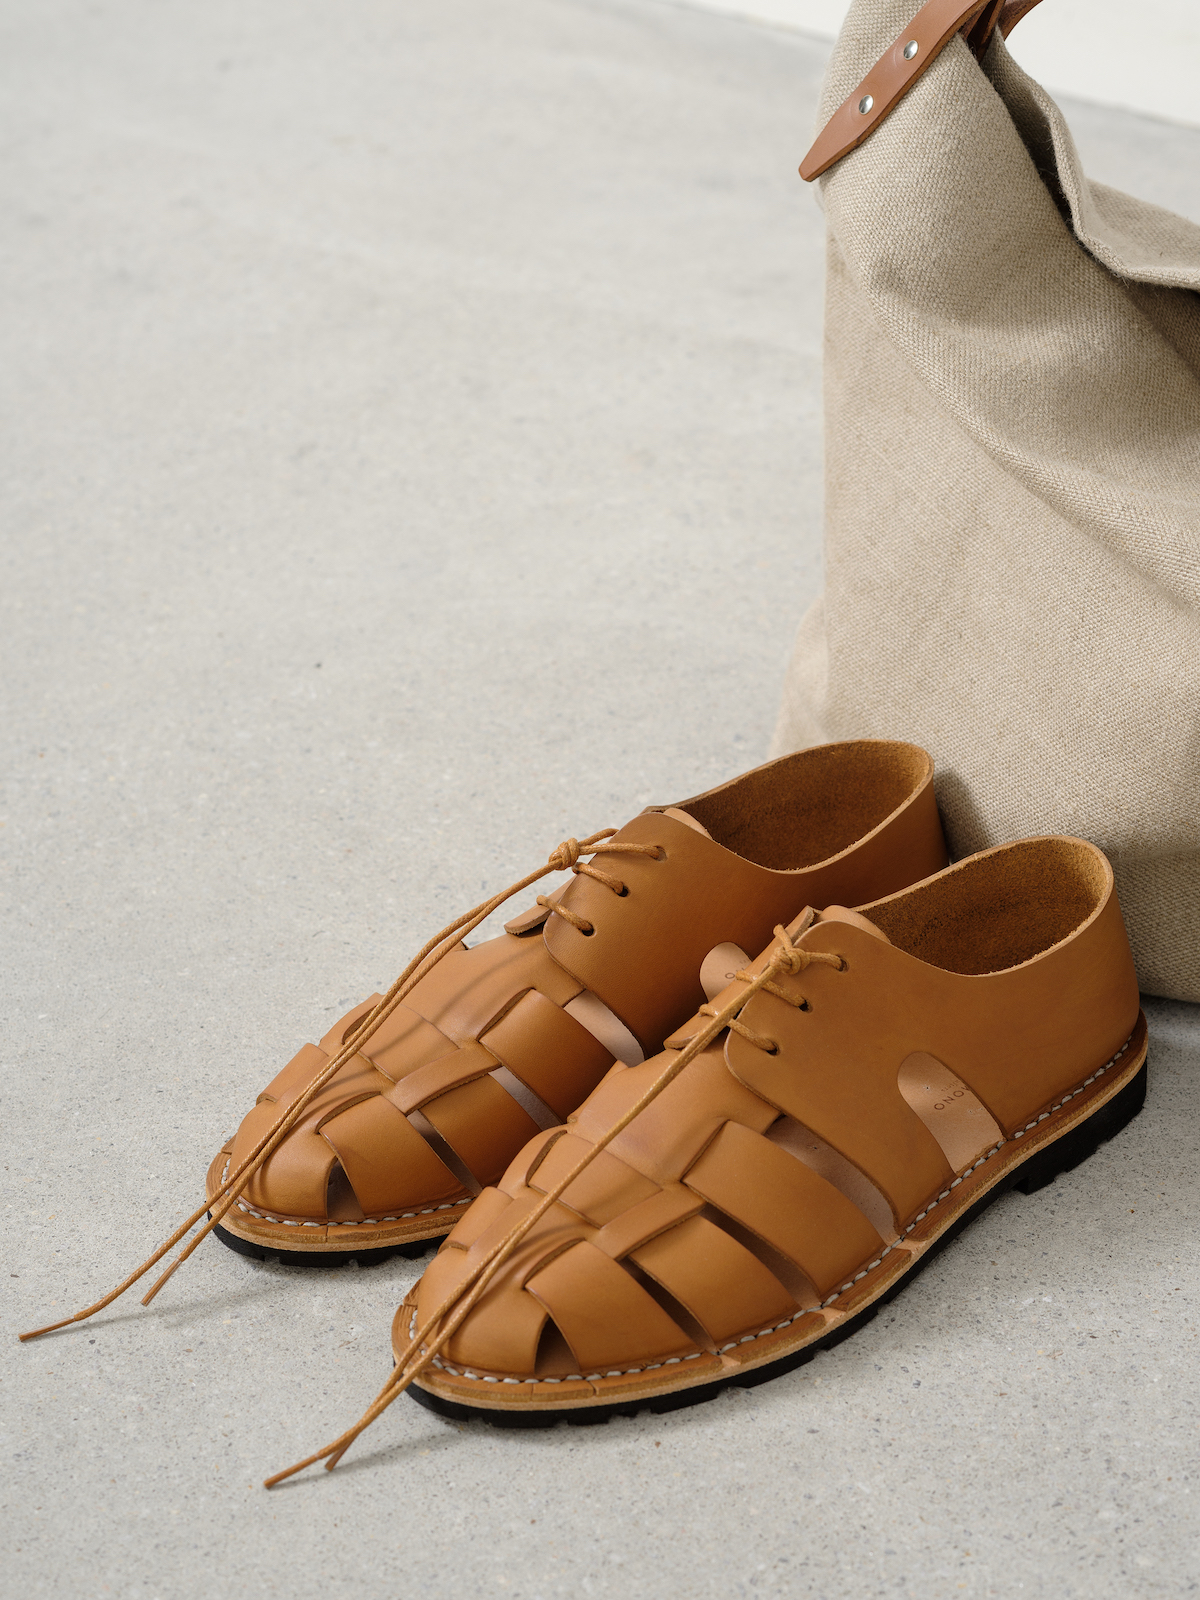 Artisanal shoes (Steve Mono) | KNITBRARY